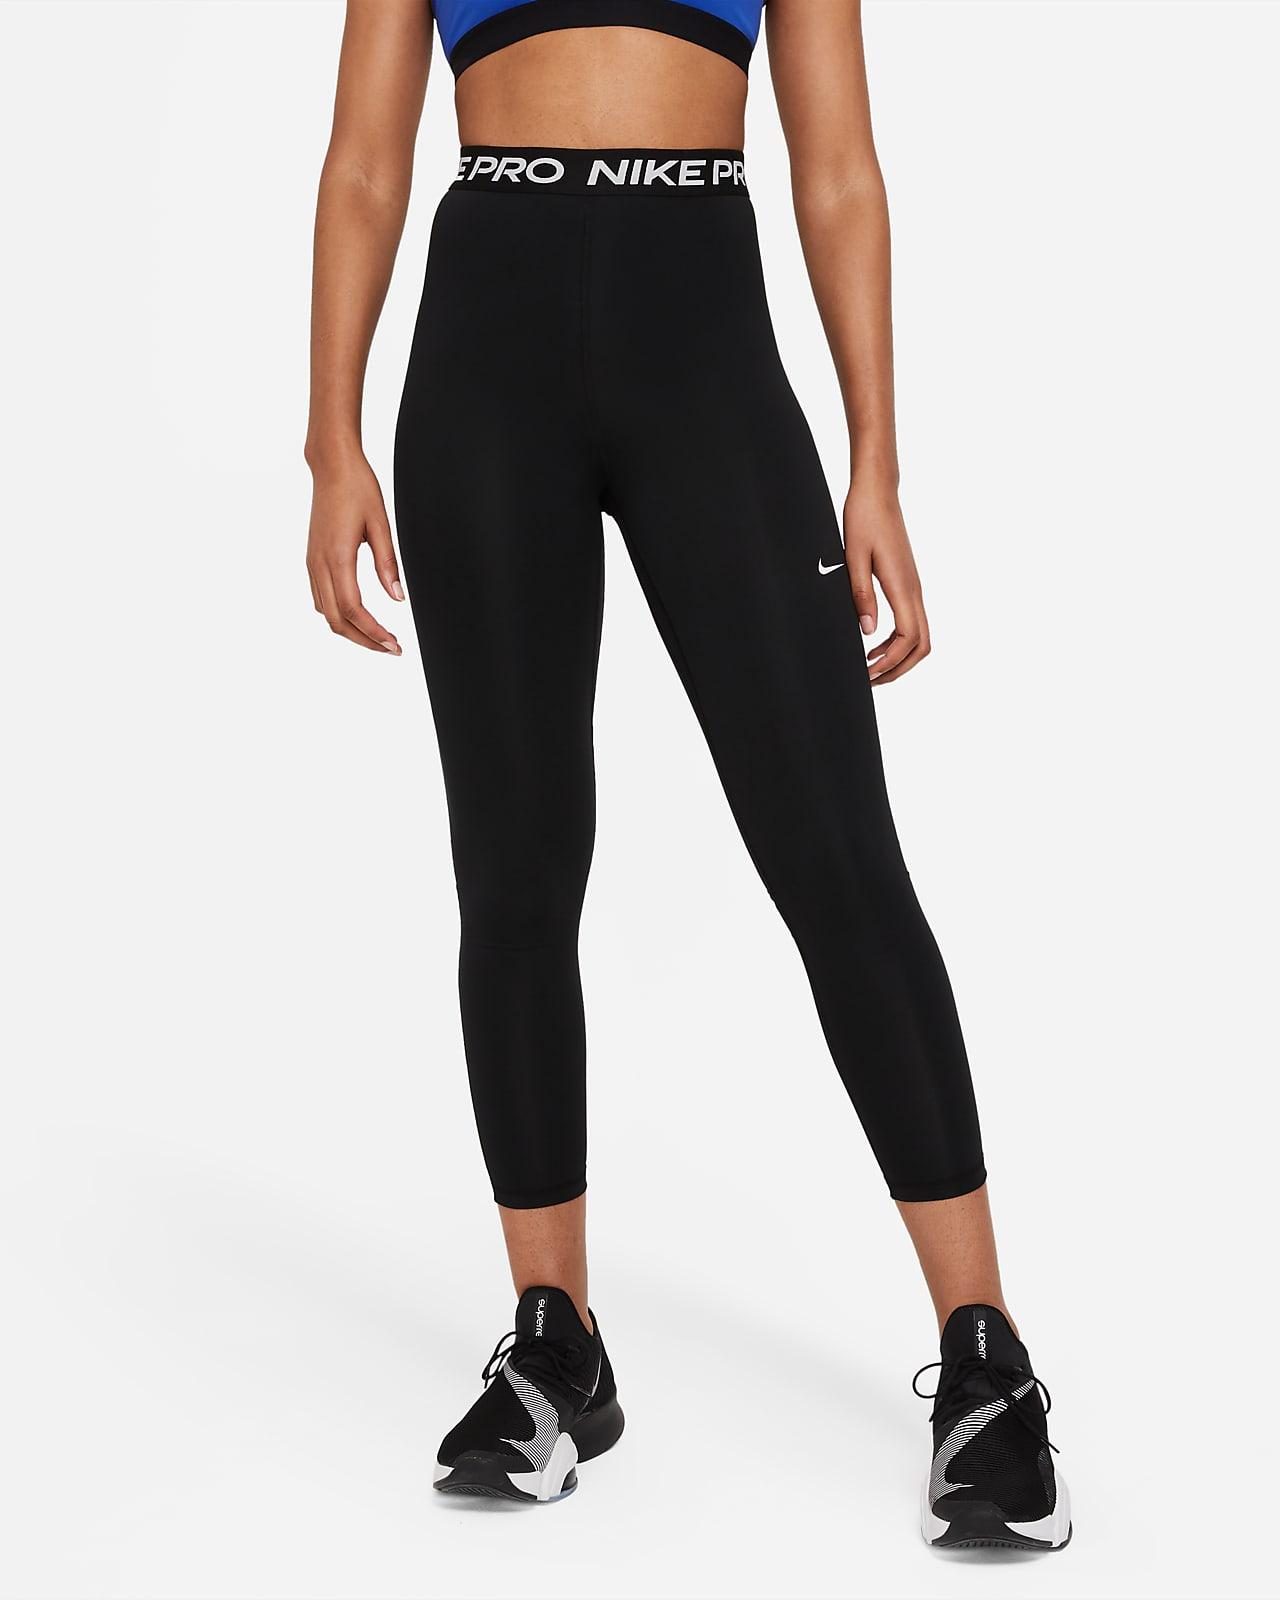 Leggings de 7/8 y tiro alto para mujer Nike Pro 365